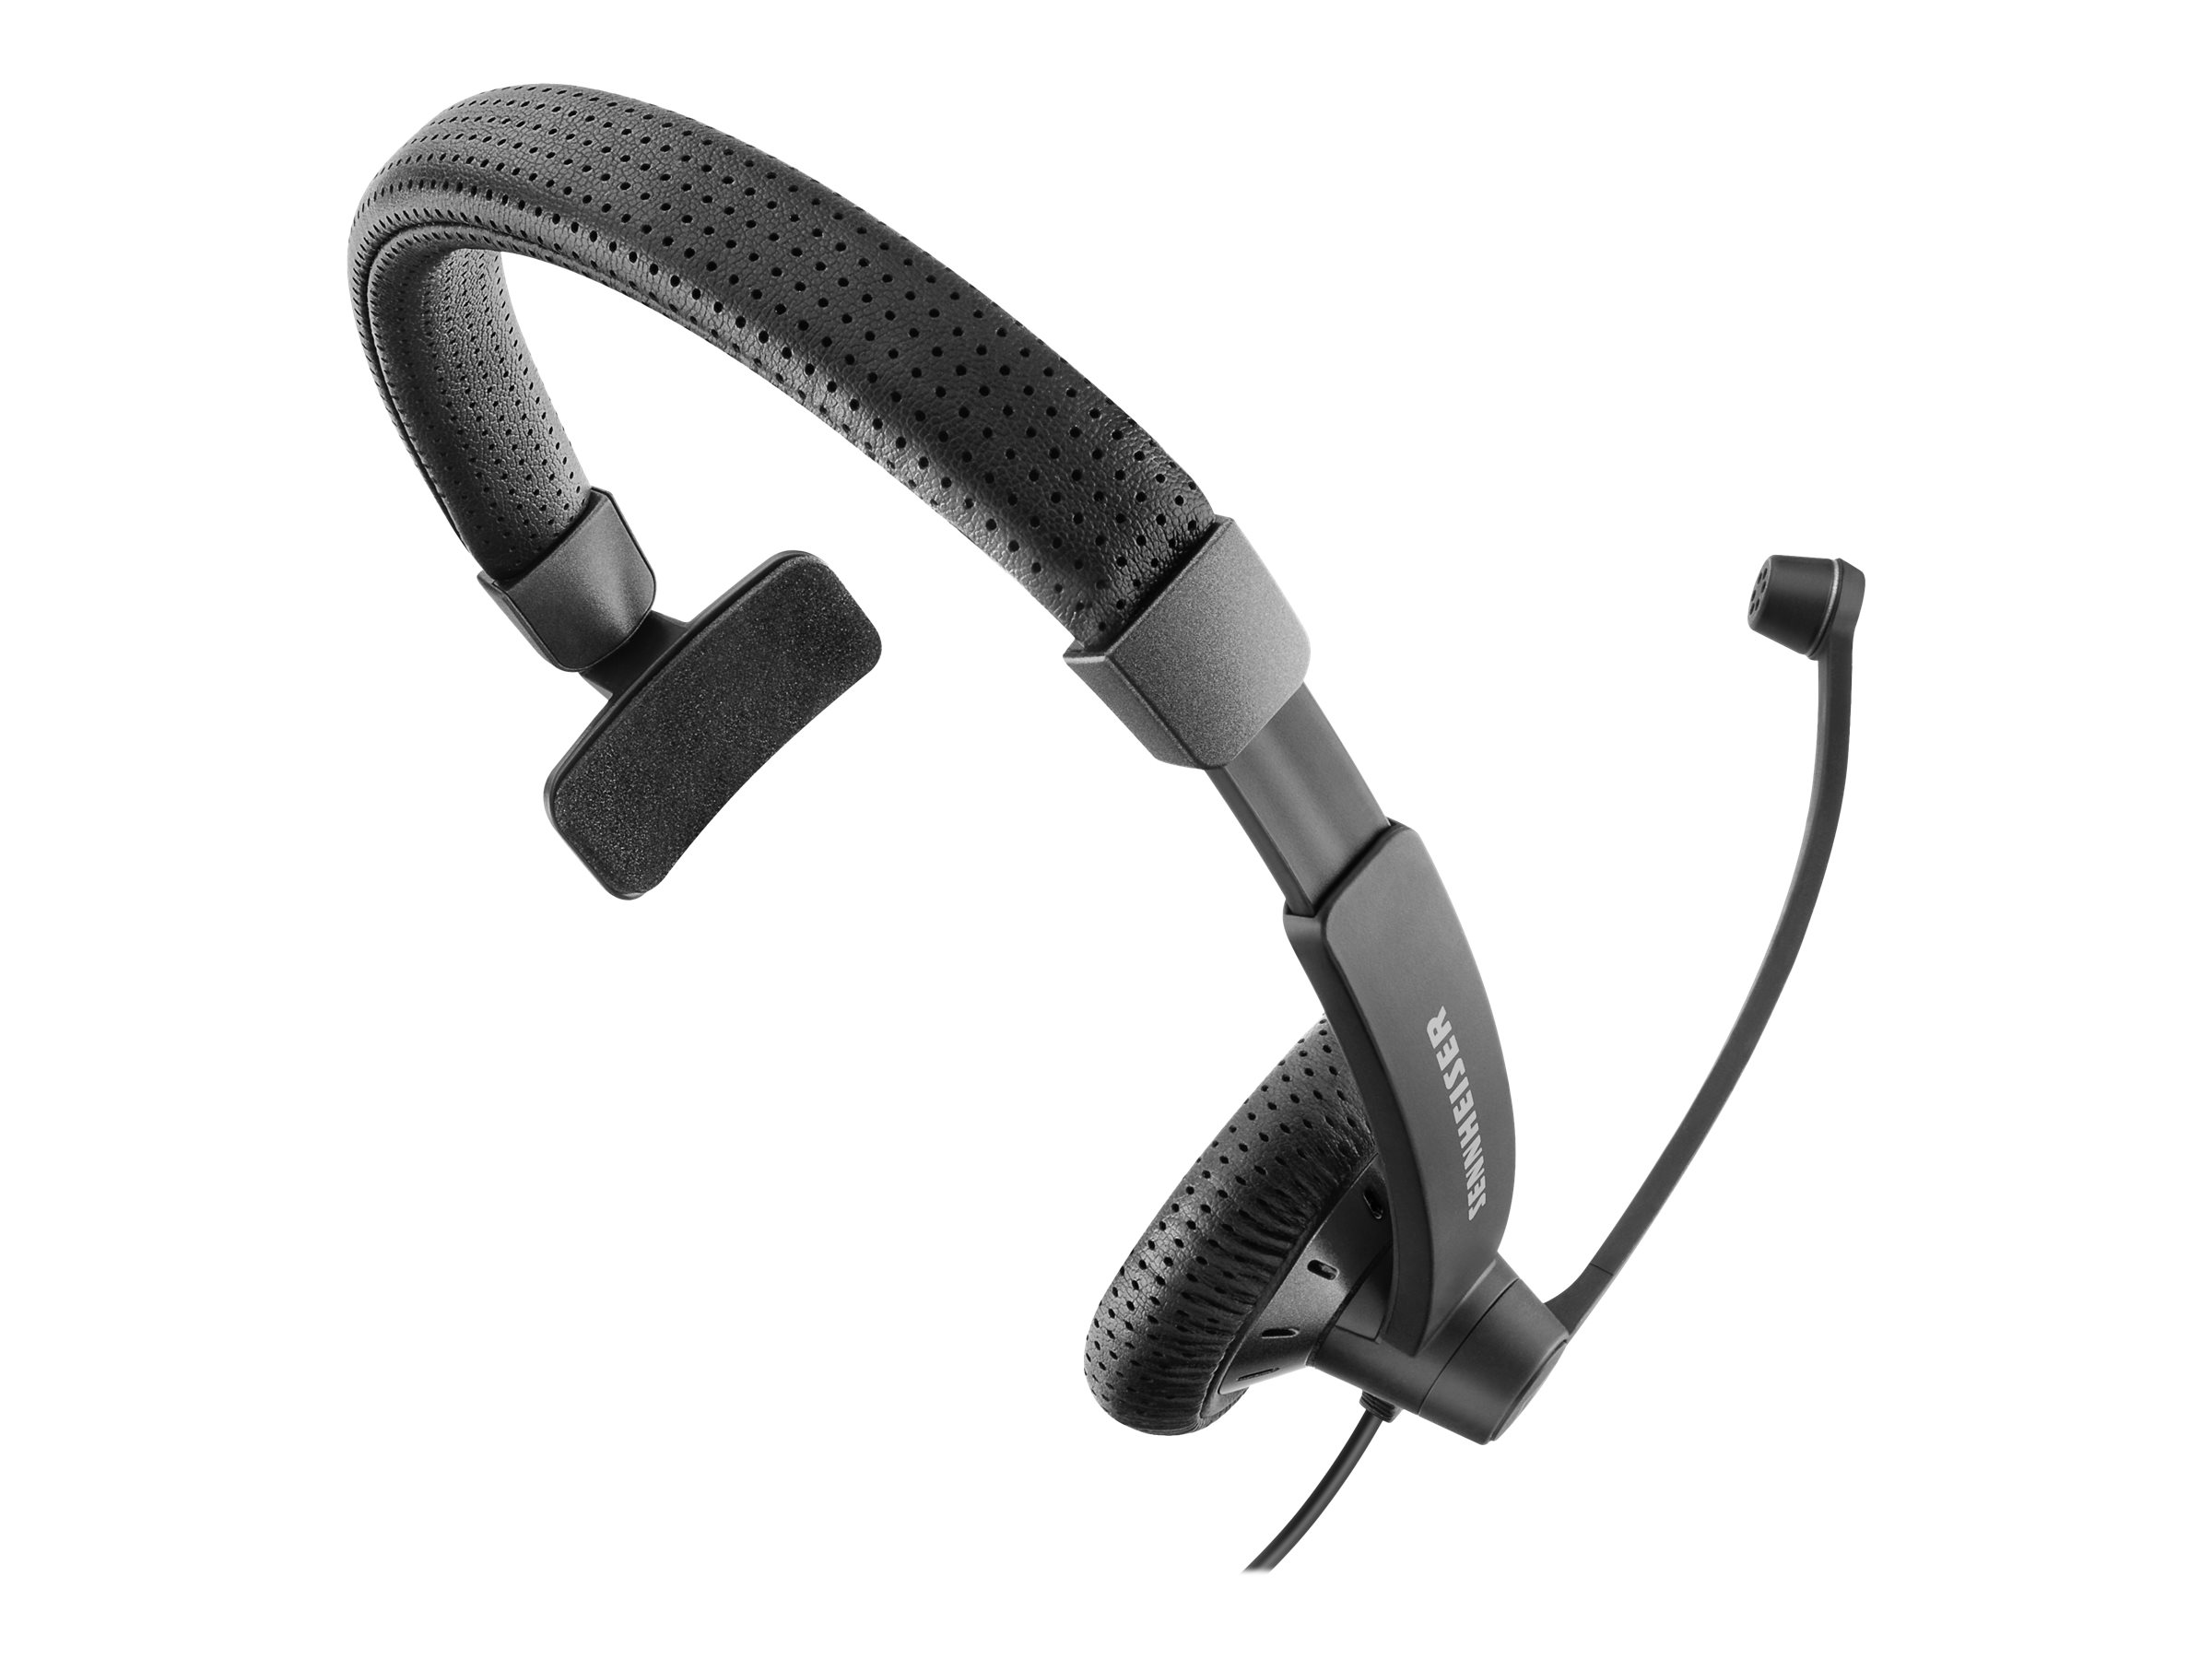 Image for Sennheiser Sc 45 Monaural Headset from Circuit City